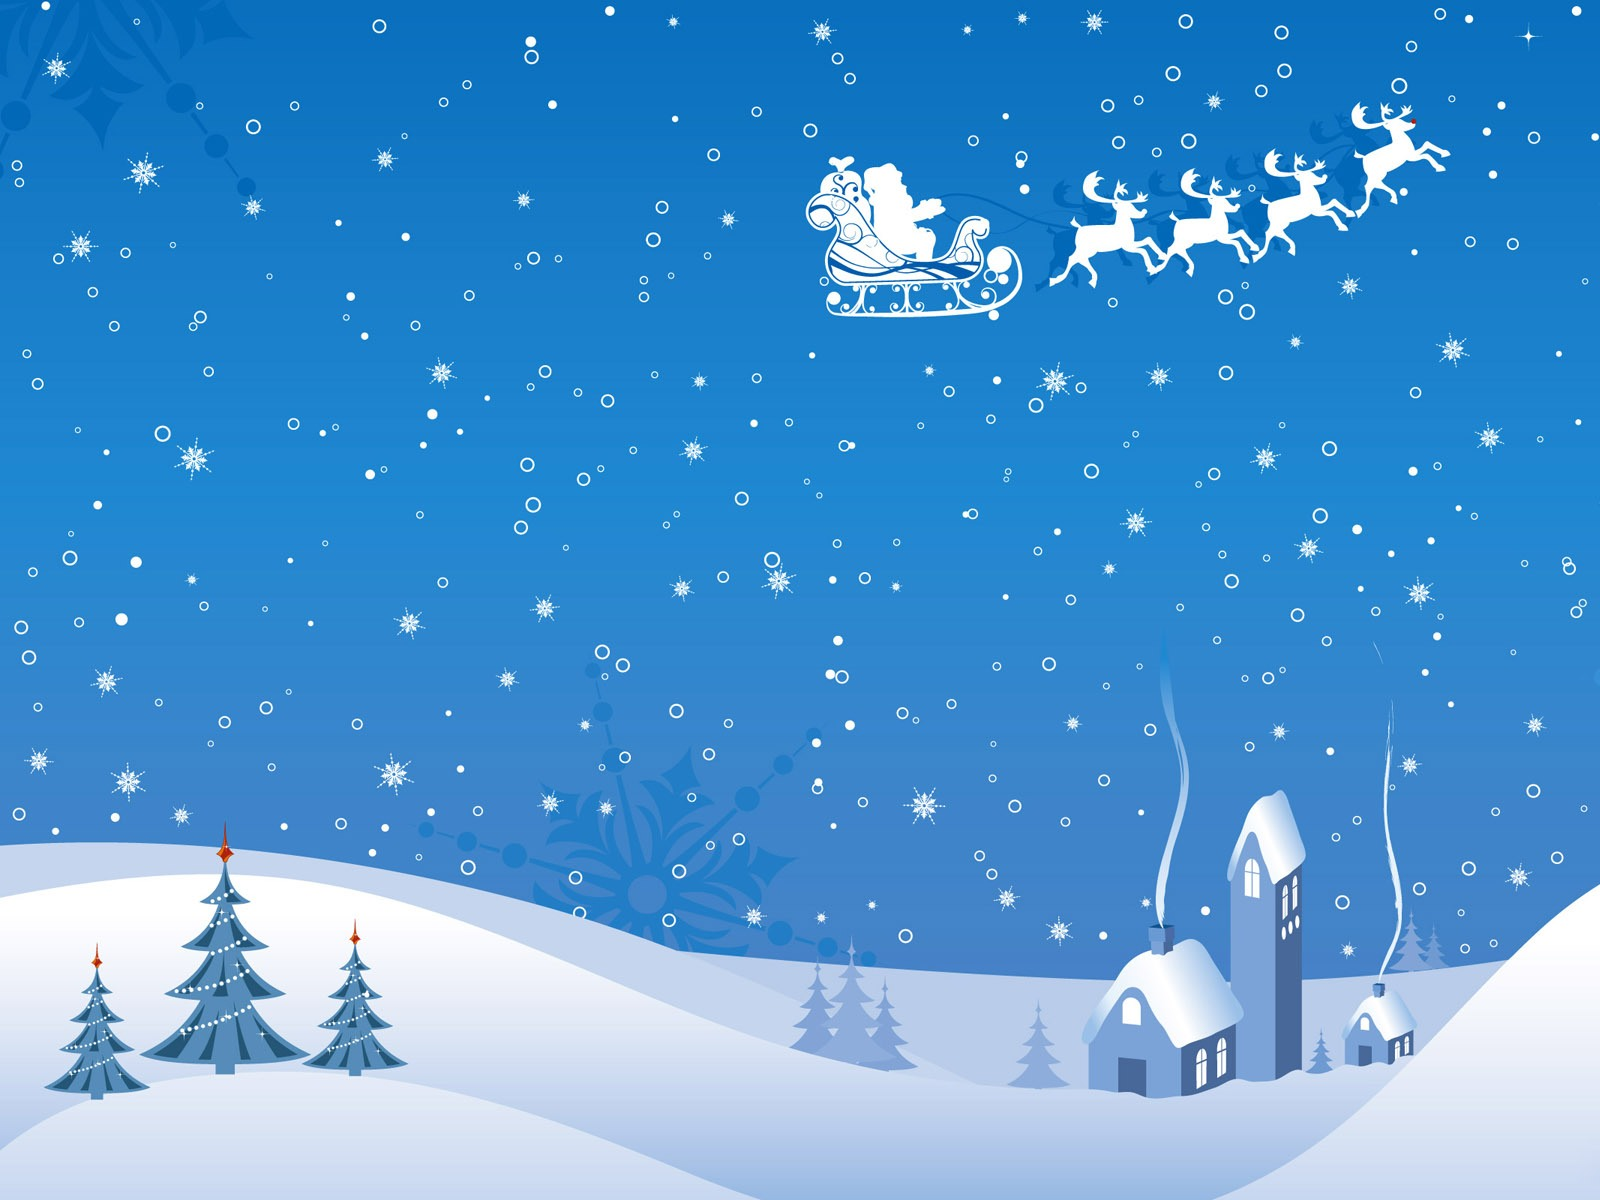 Fondos De Pantalla Navidenos: Bonitas Imagenes De Navidad Para Usar Como Fondo De Pantalla